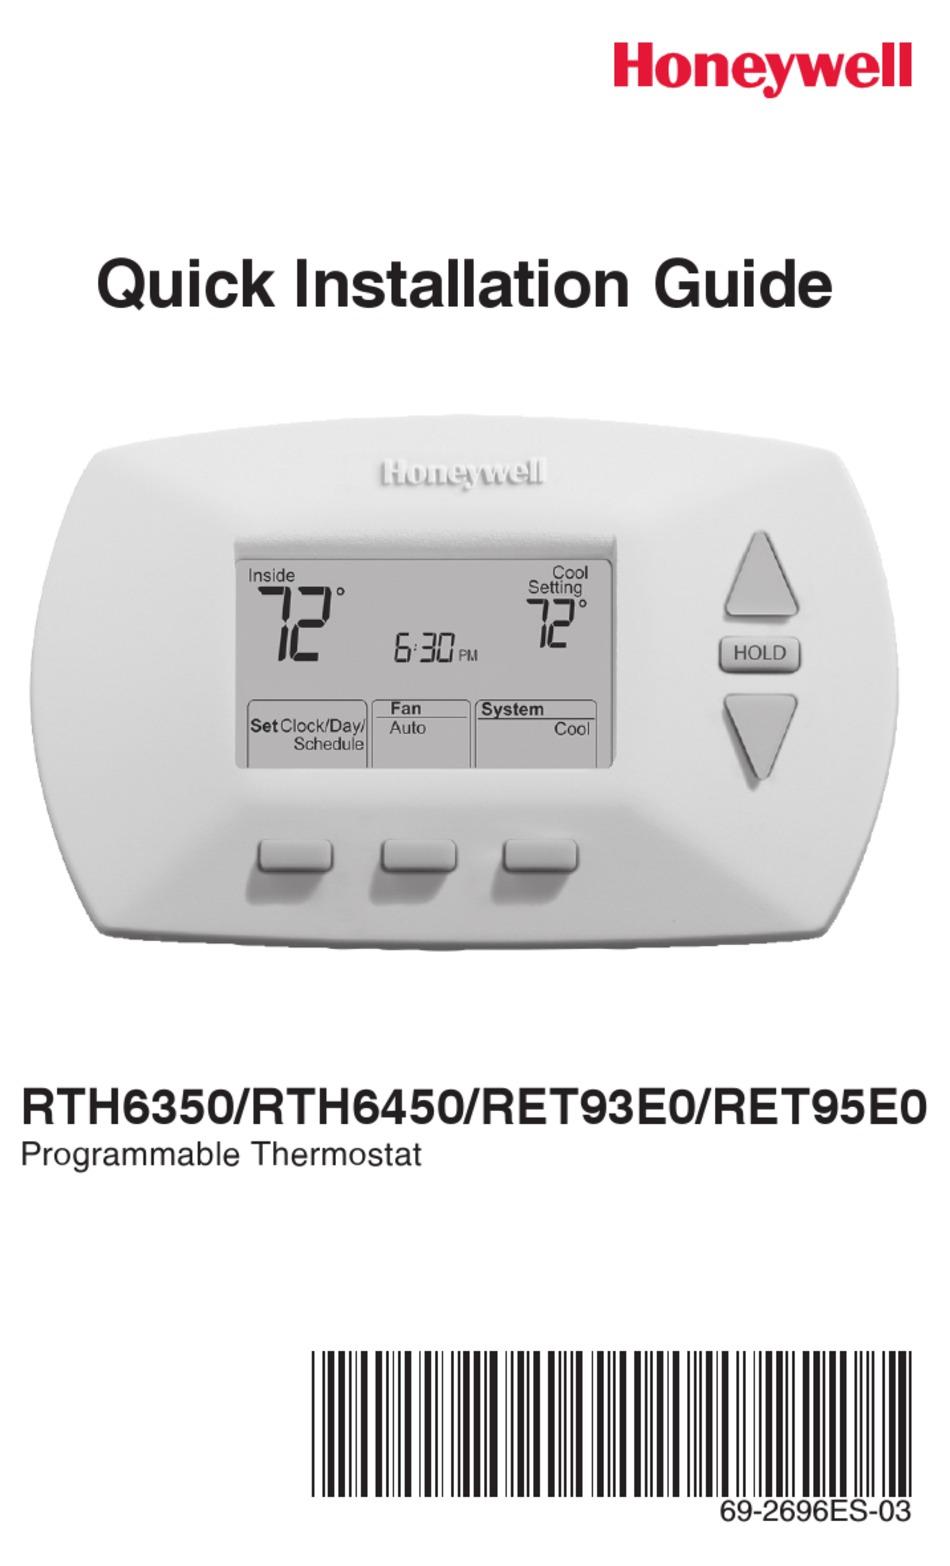 HONEYWELL RTH6350 QUICK INSTALLATION MANUAL Pdf Download | ManualsLibManualsLib